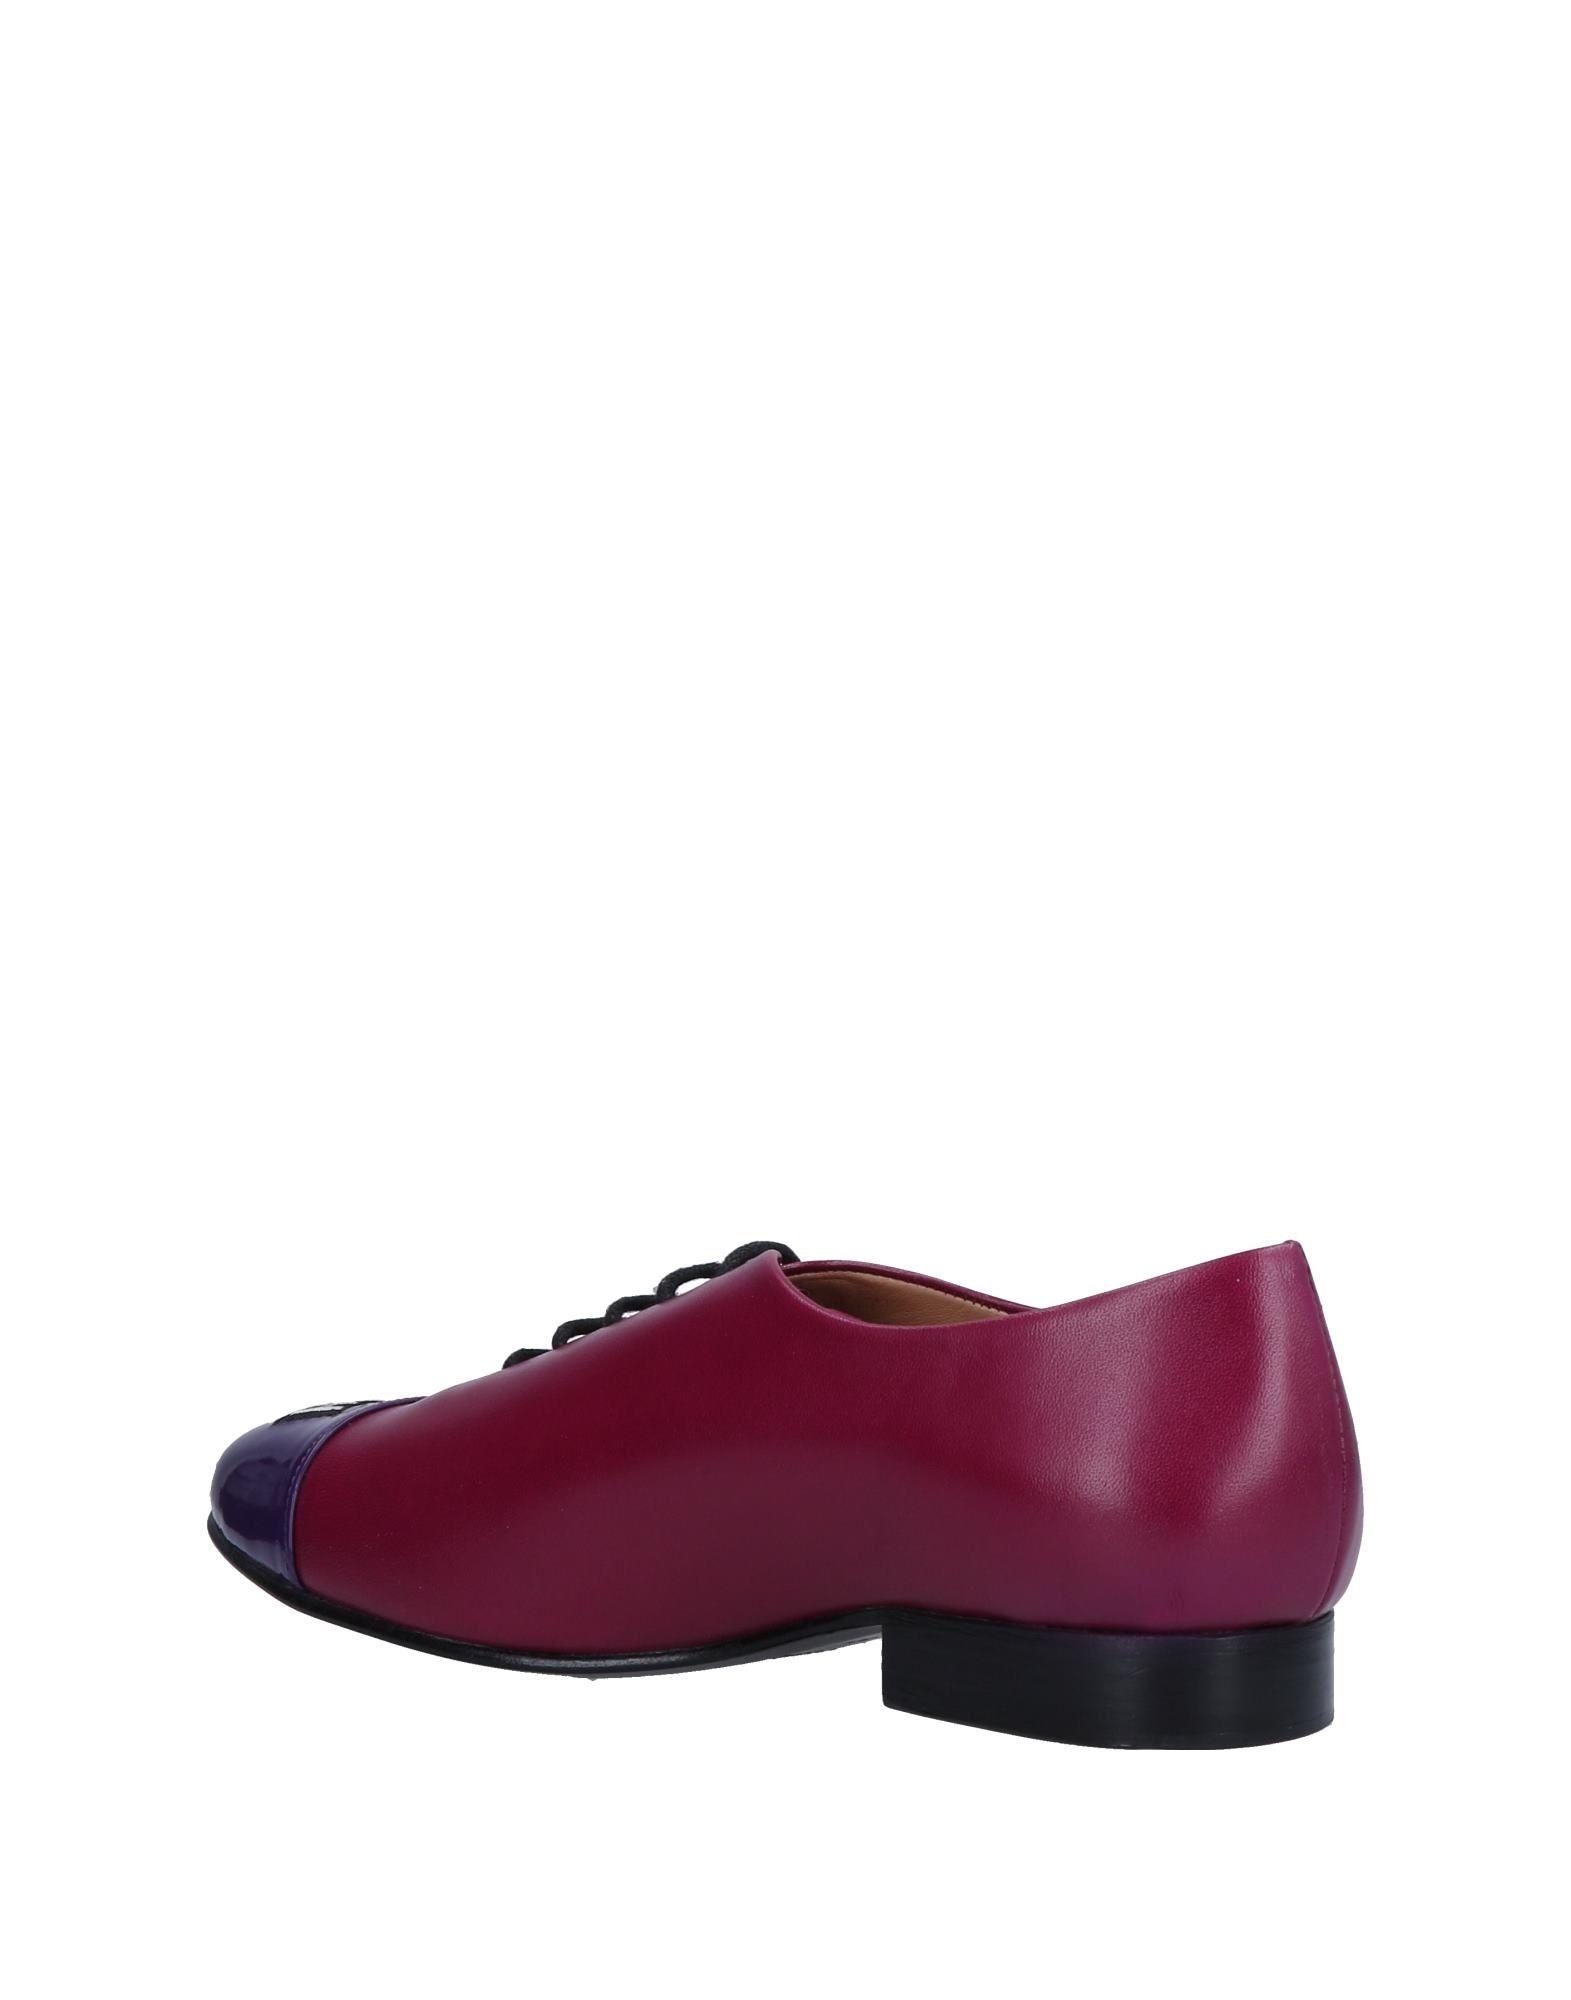 Rabatt Damen Schuhe Markus Lupfer Schnürschuhe Damen Rabatt  11519068SL cfd510